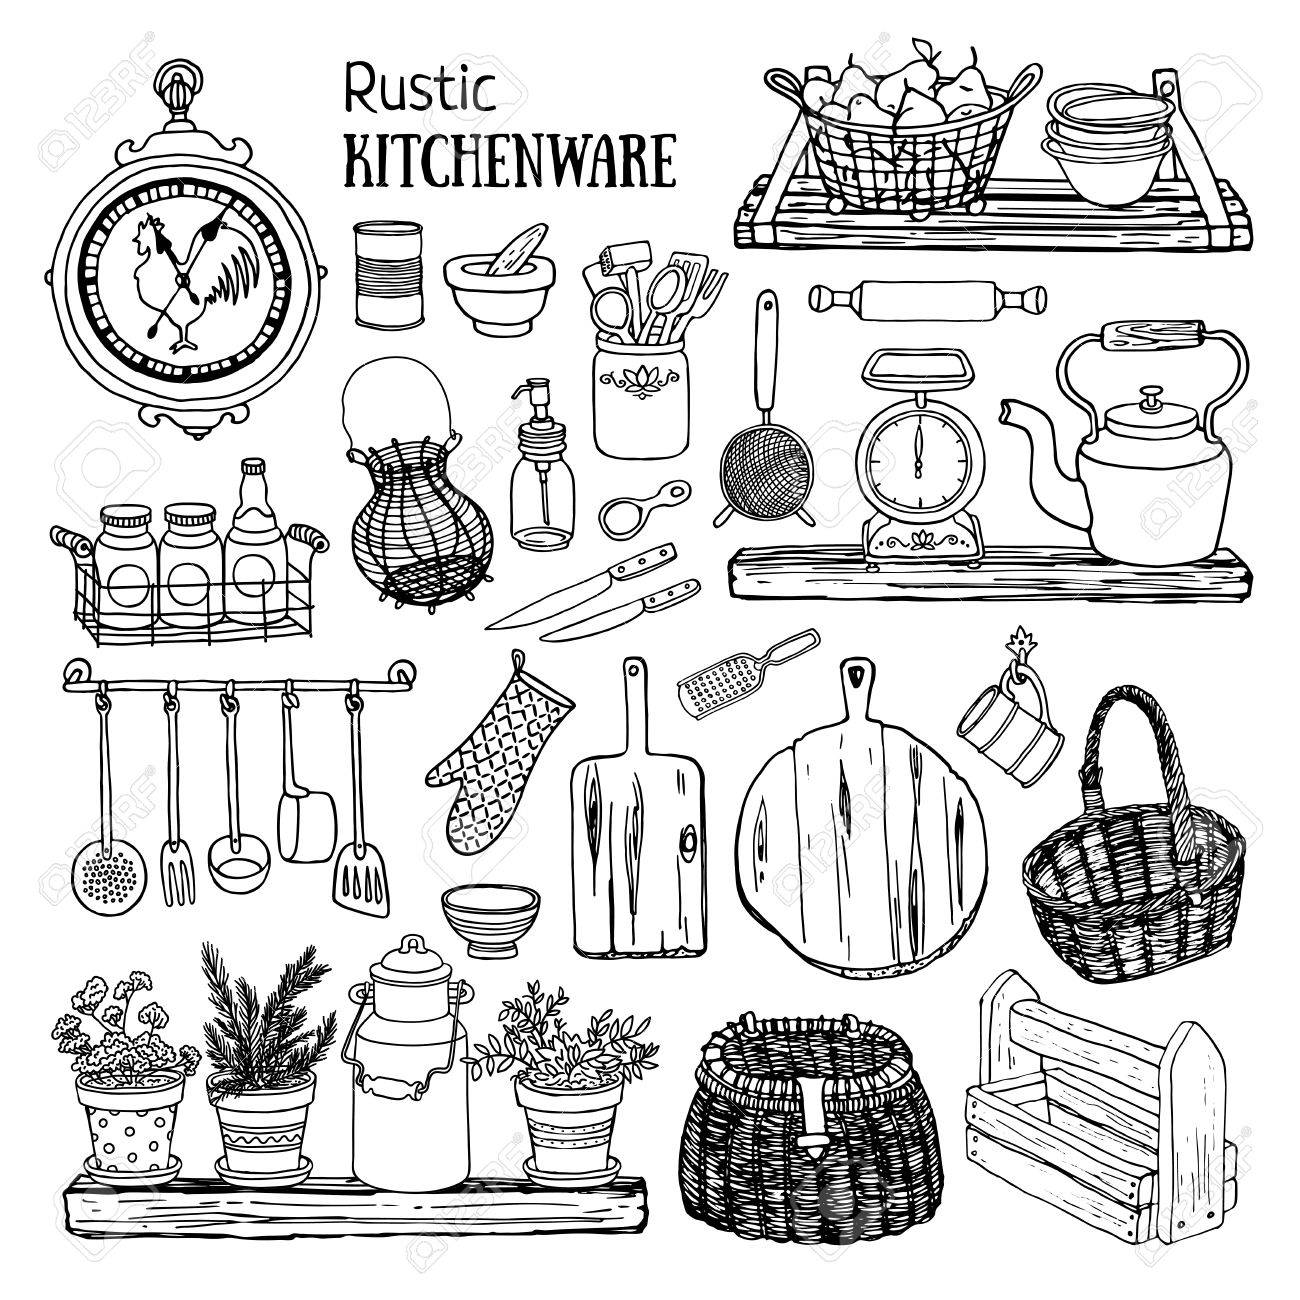 Hand Drawn Illustration Rustic Kitchen Set Black And White Sketch